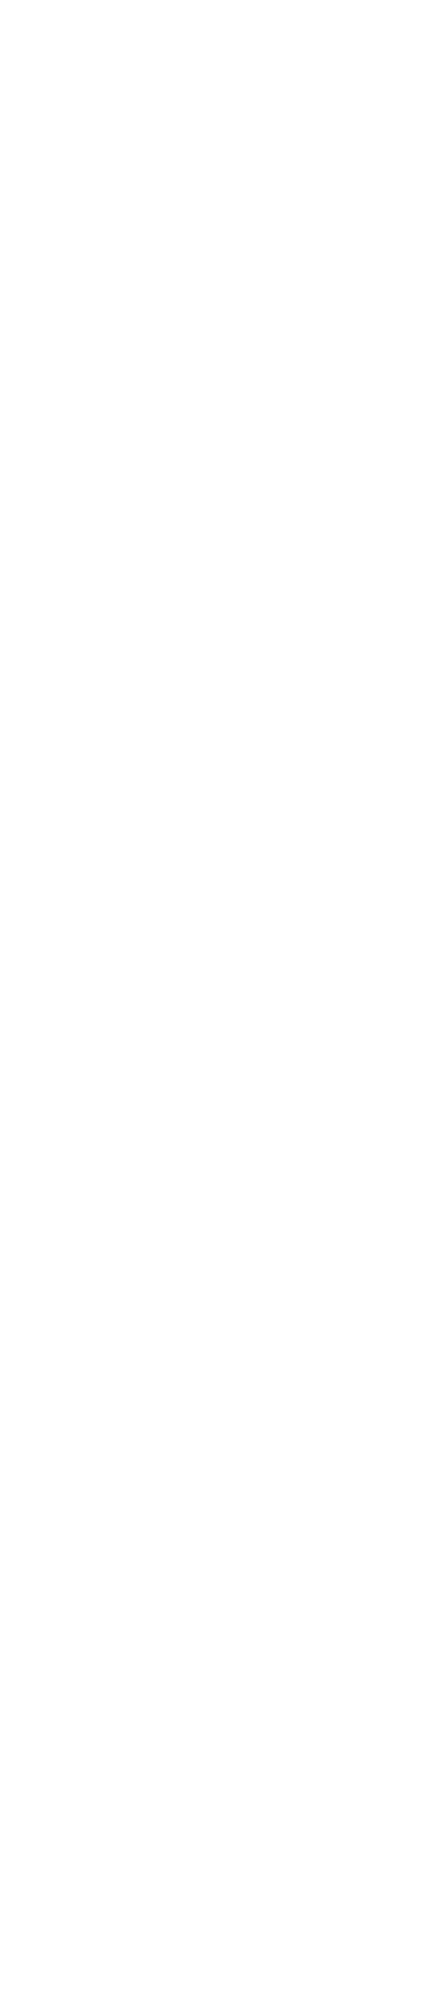 Yermanasca Due